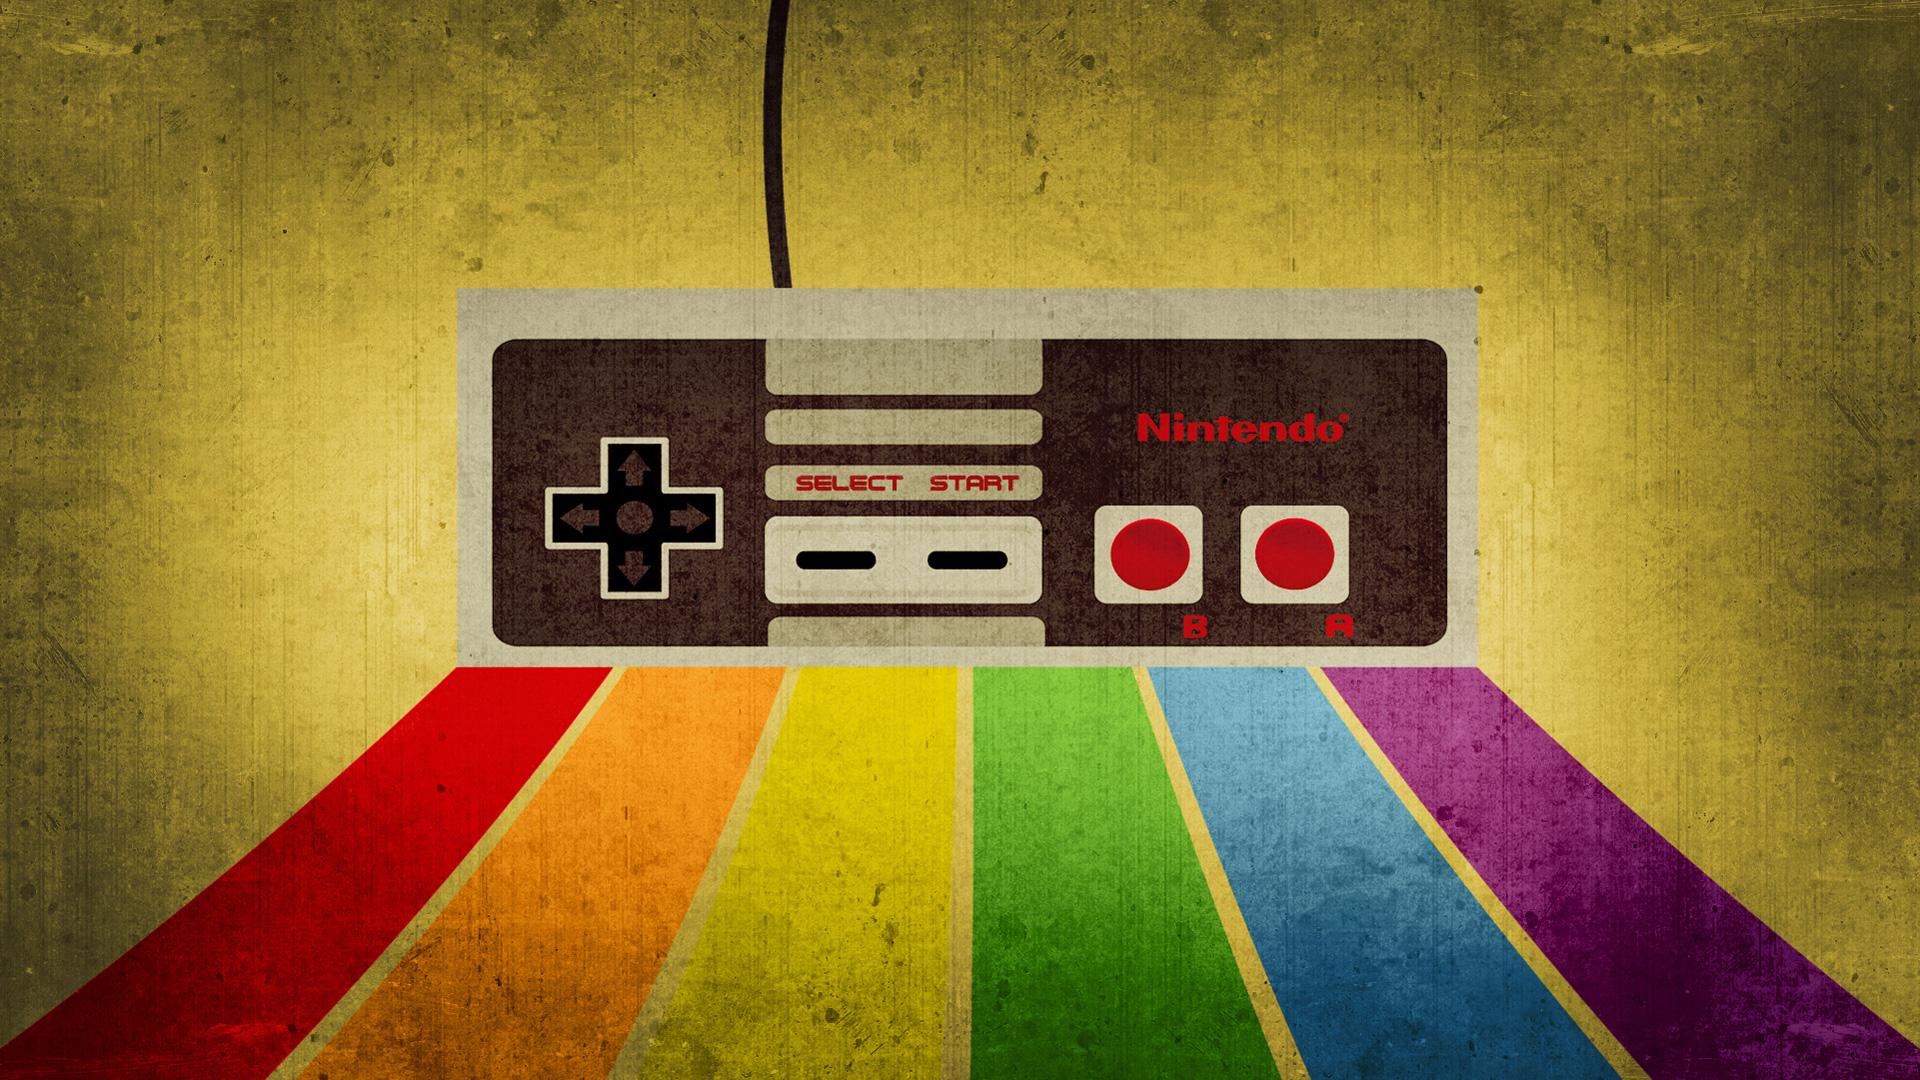 Nintendo Retro Gaming HD Wallpaper 1920x1080